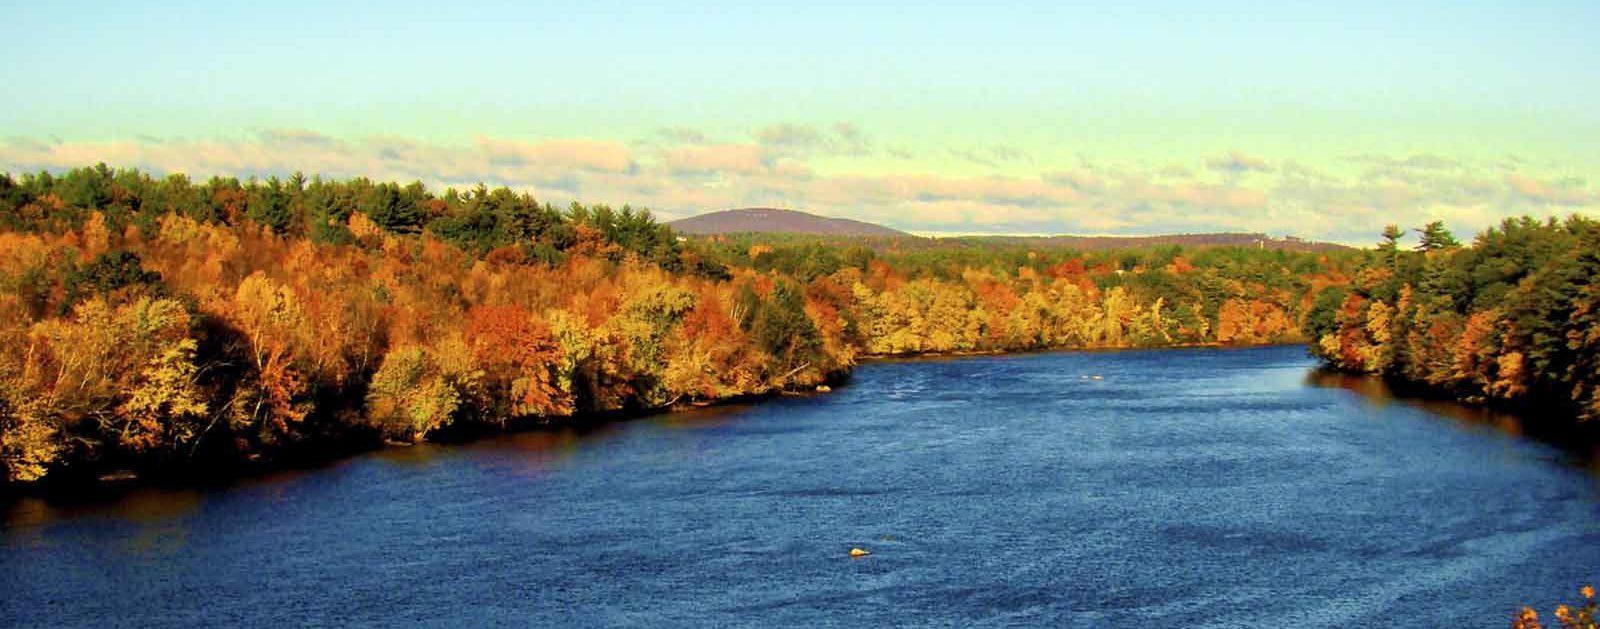 Merrimack River   Merrimack River Watershed Council